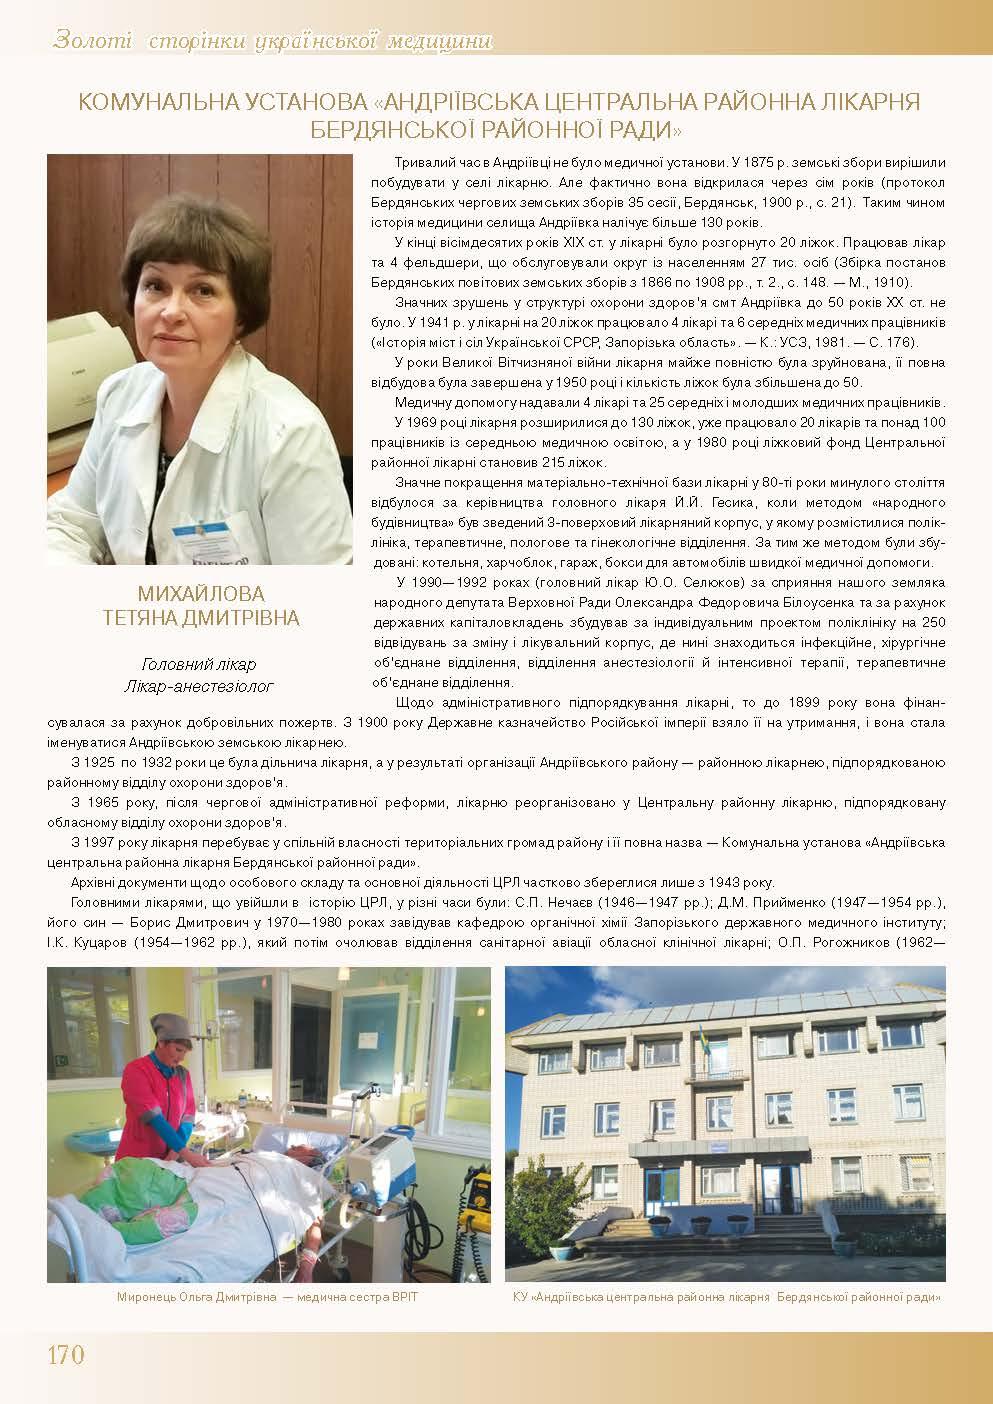 Комунальна установа «Андріївська центральна районна лікарня Бердянської районної ради»